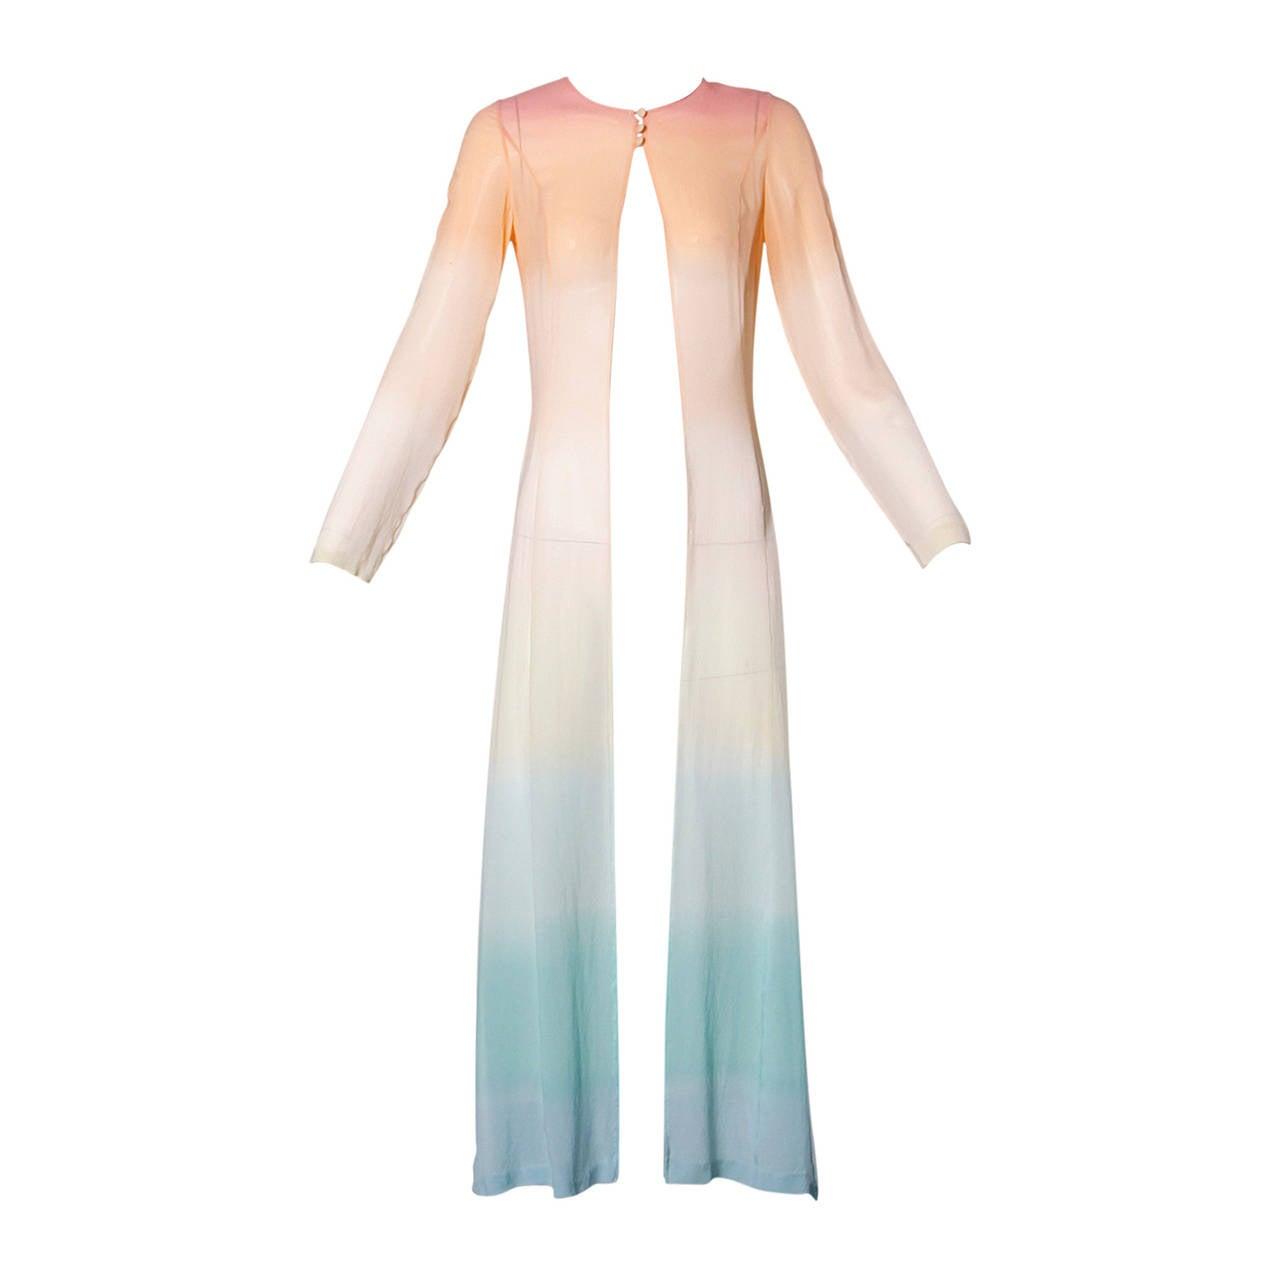 Louis Feraud Vintage Ombre Silk Kimono Duster or Maxi Coat 1